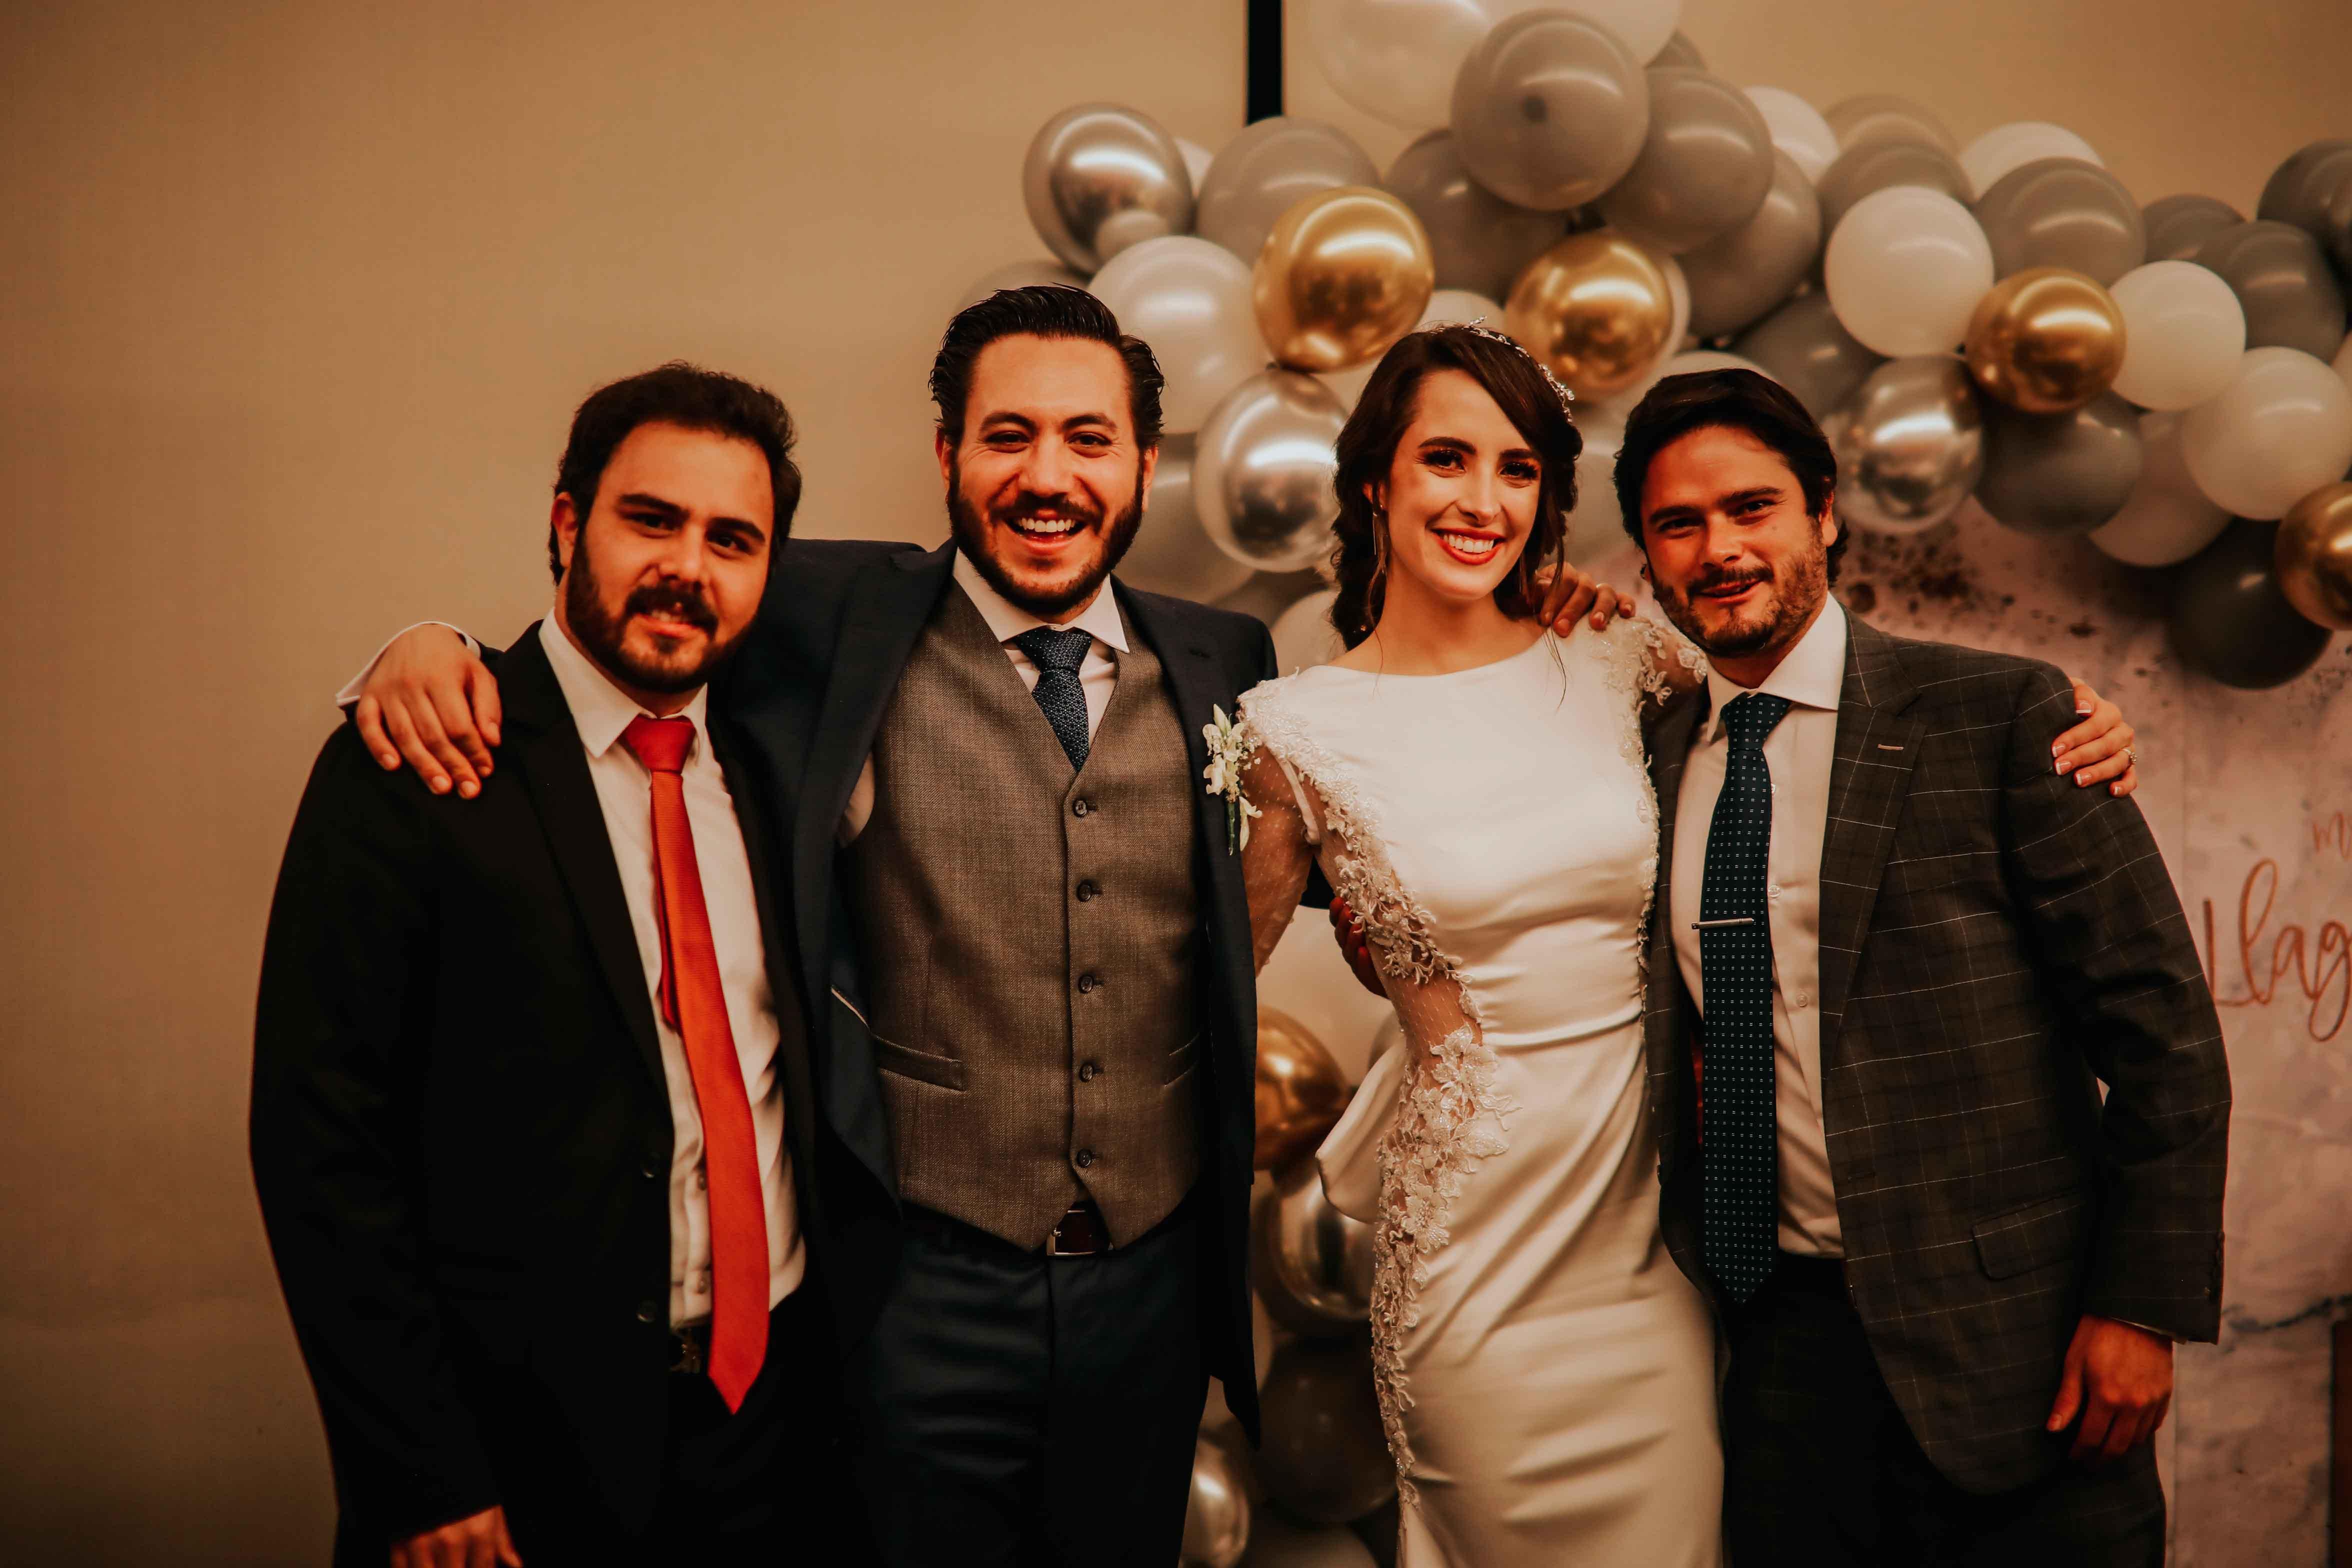 13.-Diego-Said-Pretelini,-José-Julián,-Gio,-Mauricio-Salas